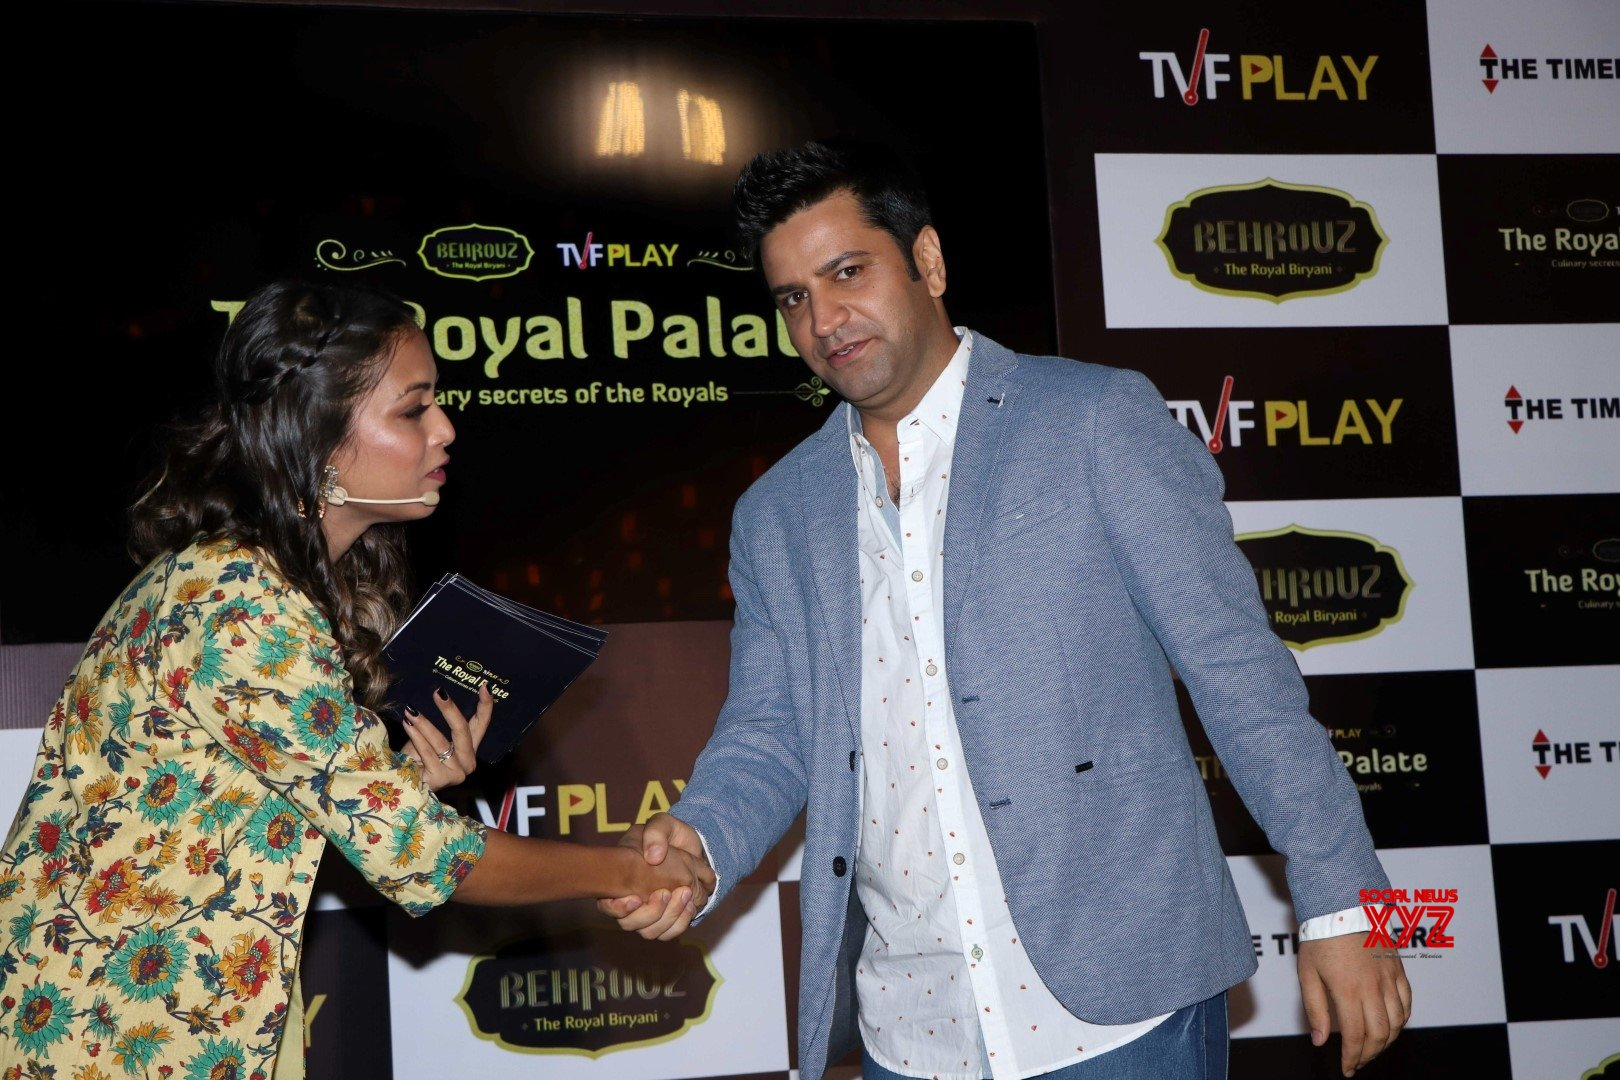 Mumbai: Show launch - The Royal Palate: culinary secrets of the royals - Chef Kunal Kapur #Gallery